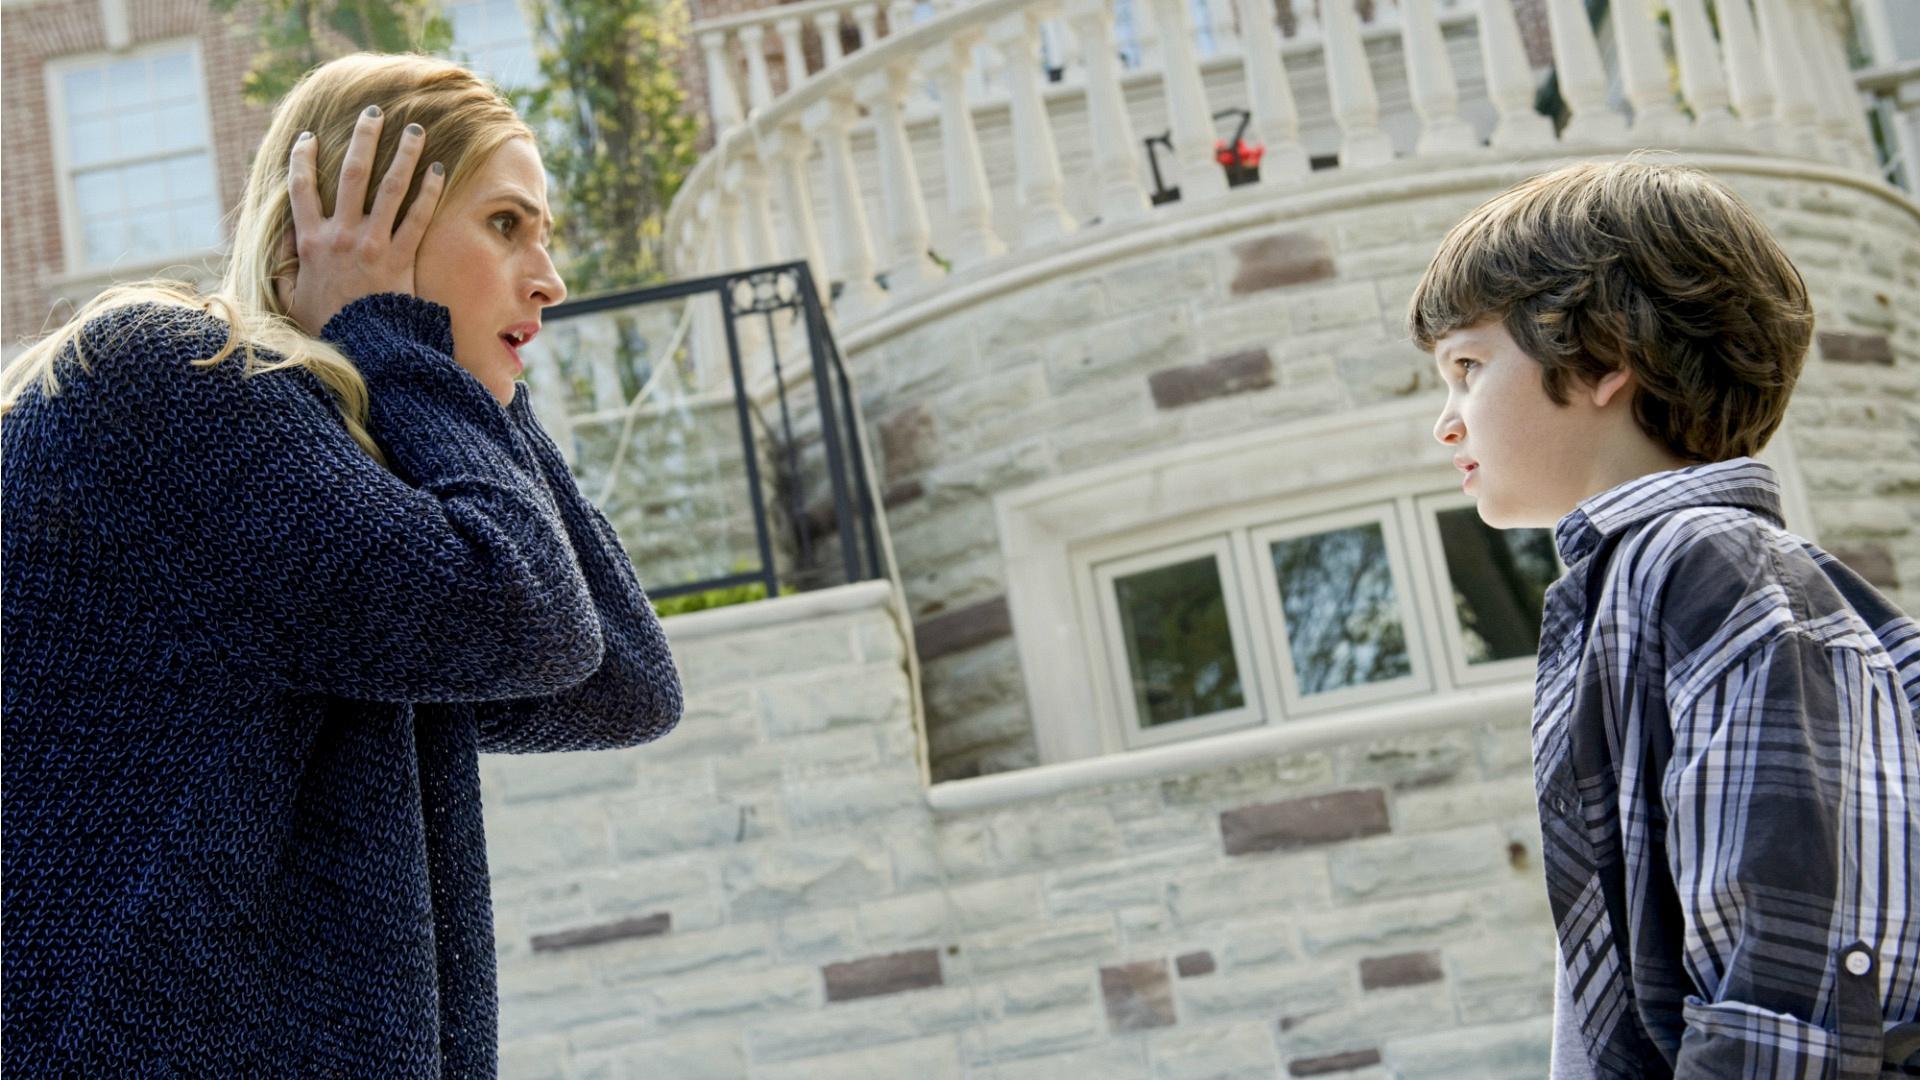 Tessa is shocked by Jack's behavior.